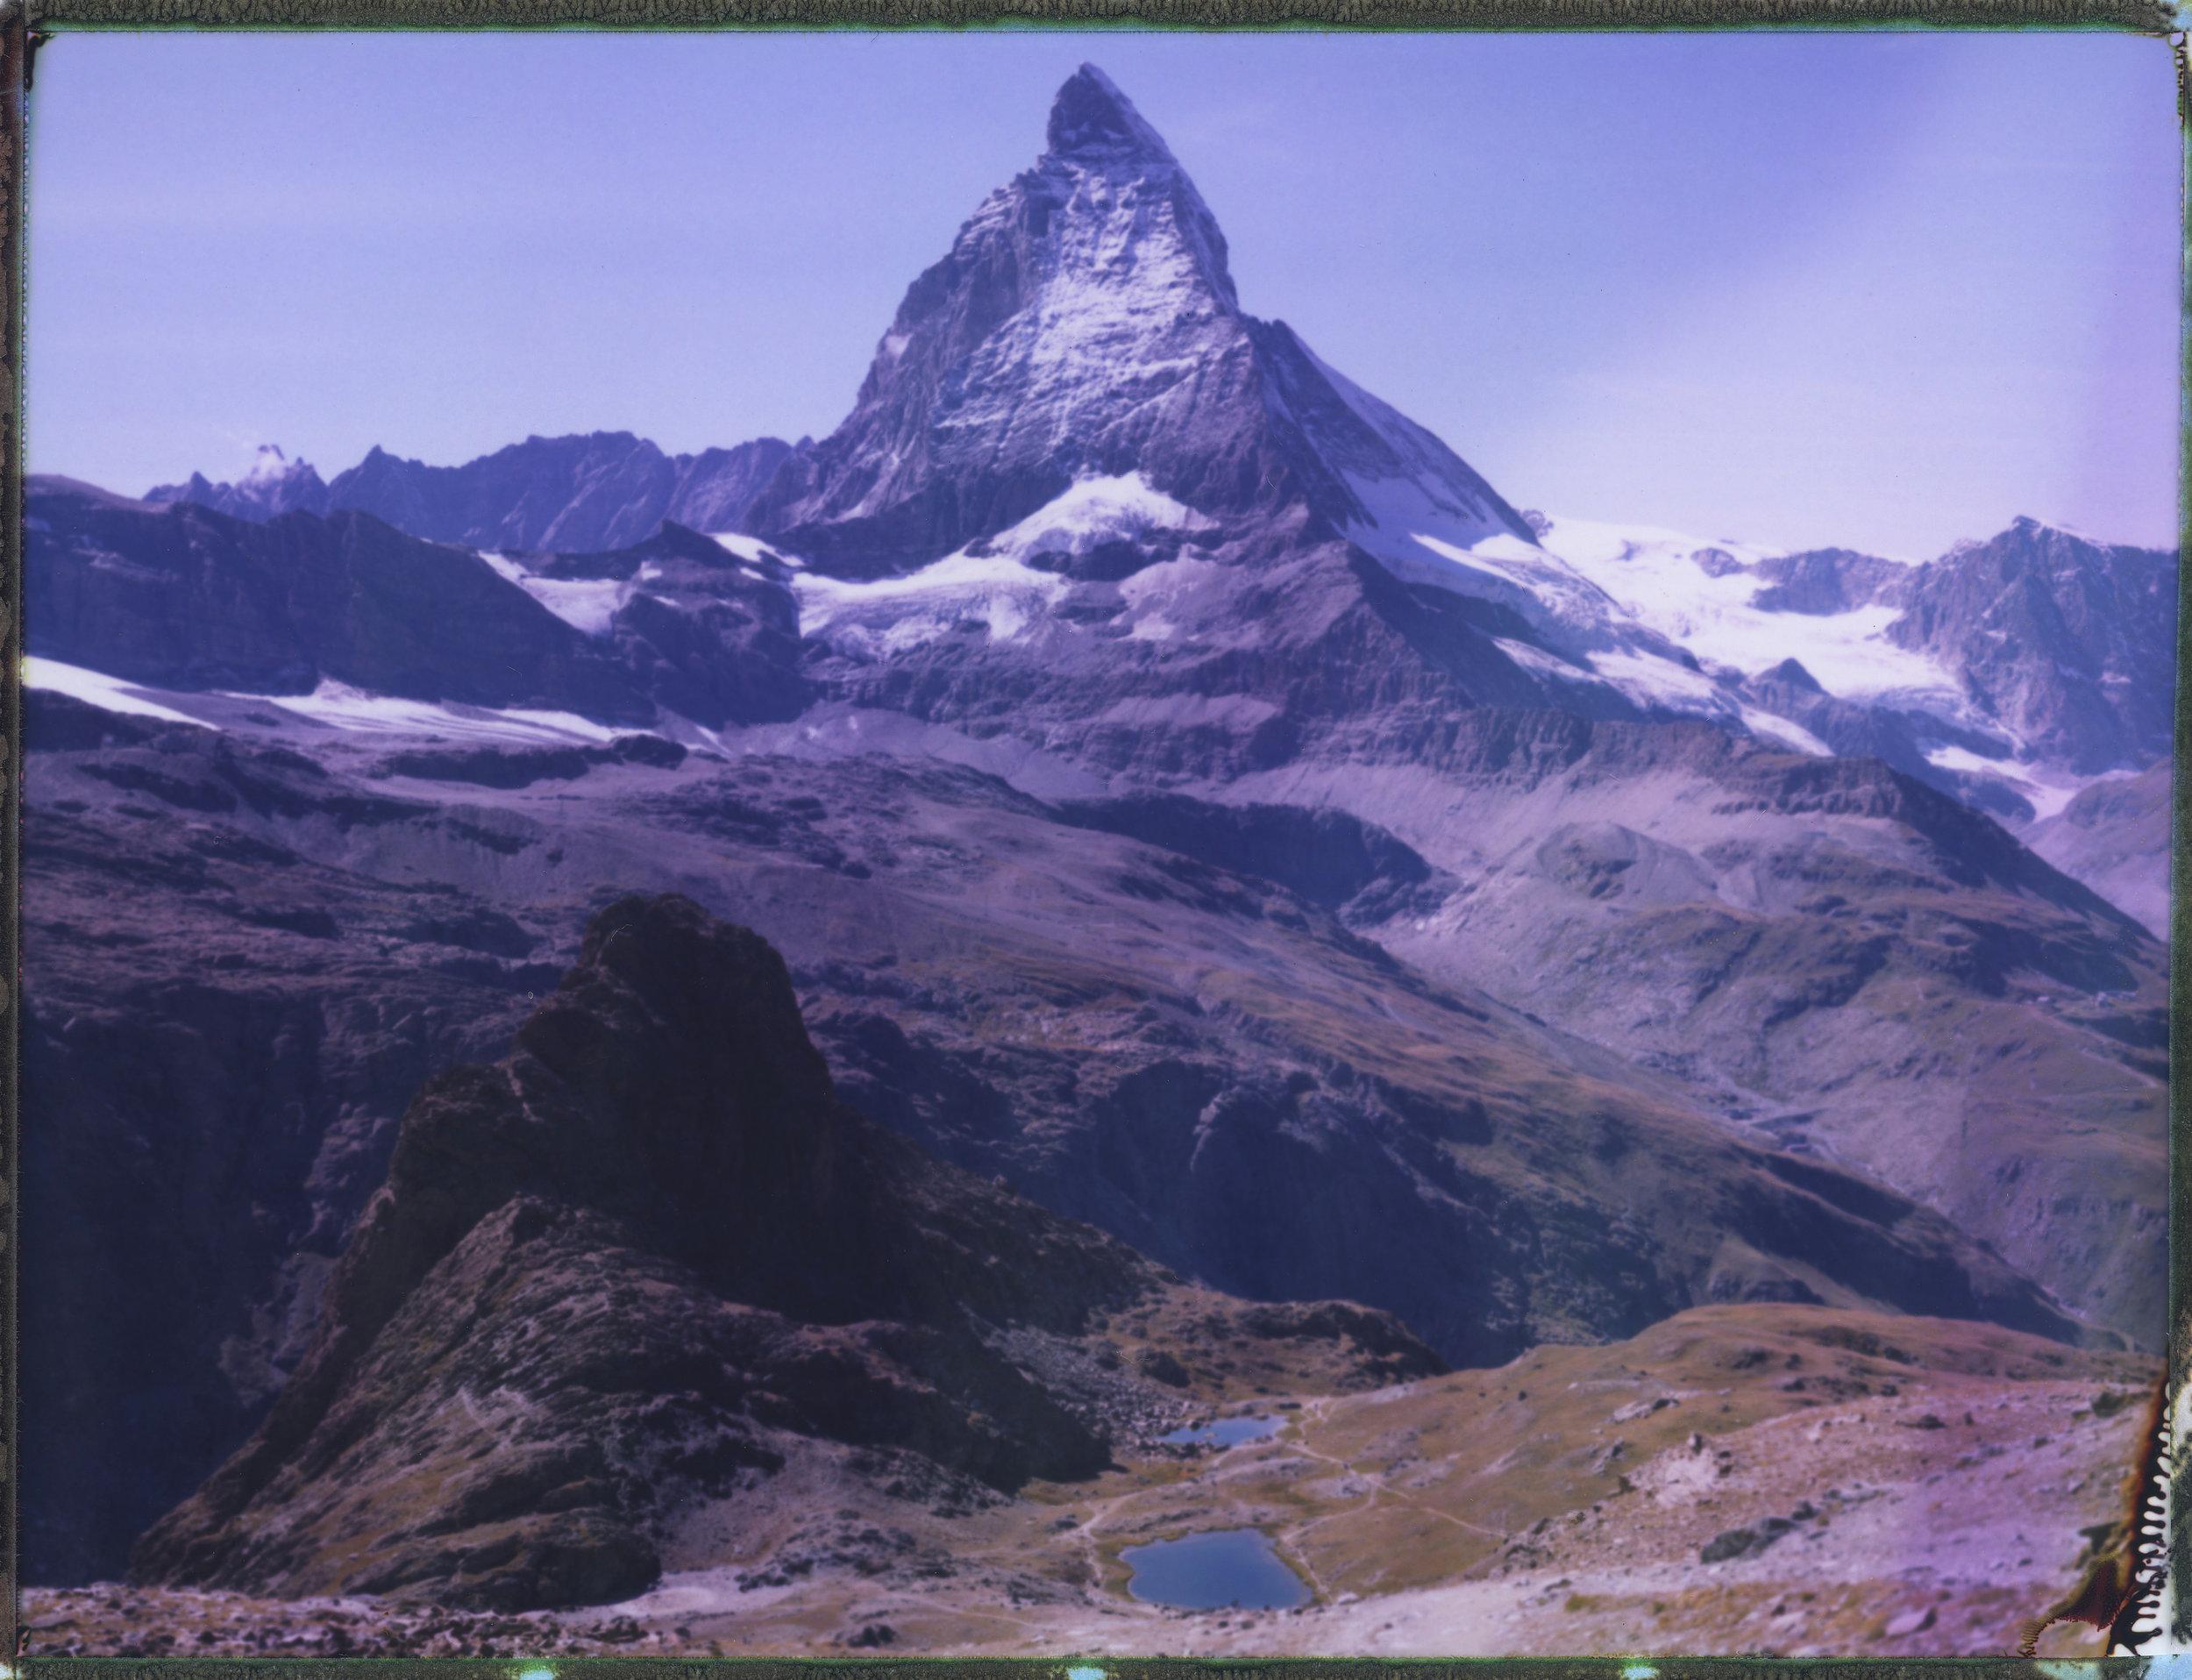 Schweiz_Gornergrat_Matterhorn_Riffelsee_FUJI_Randlos.jpg